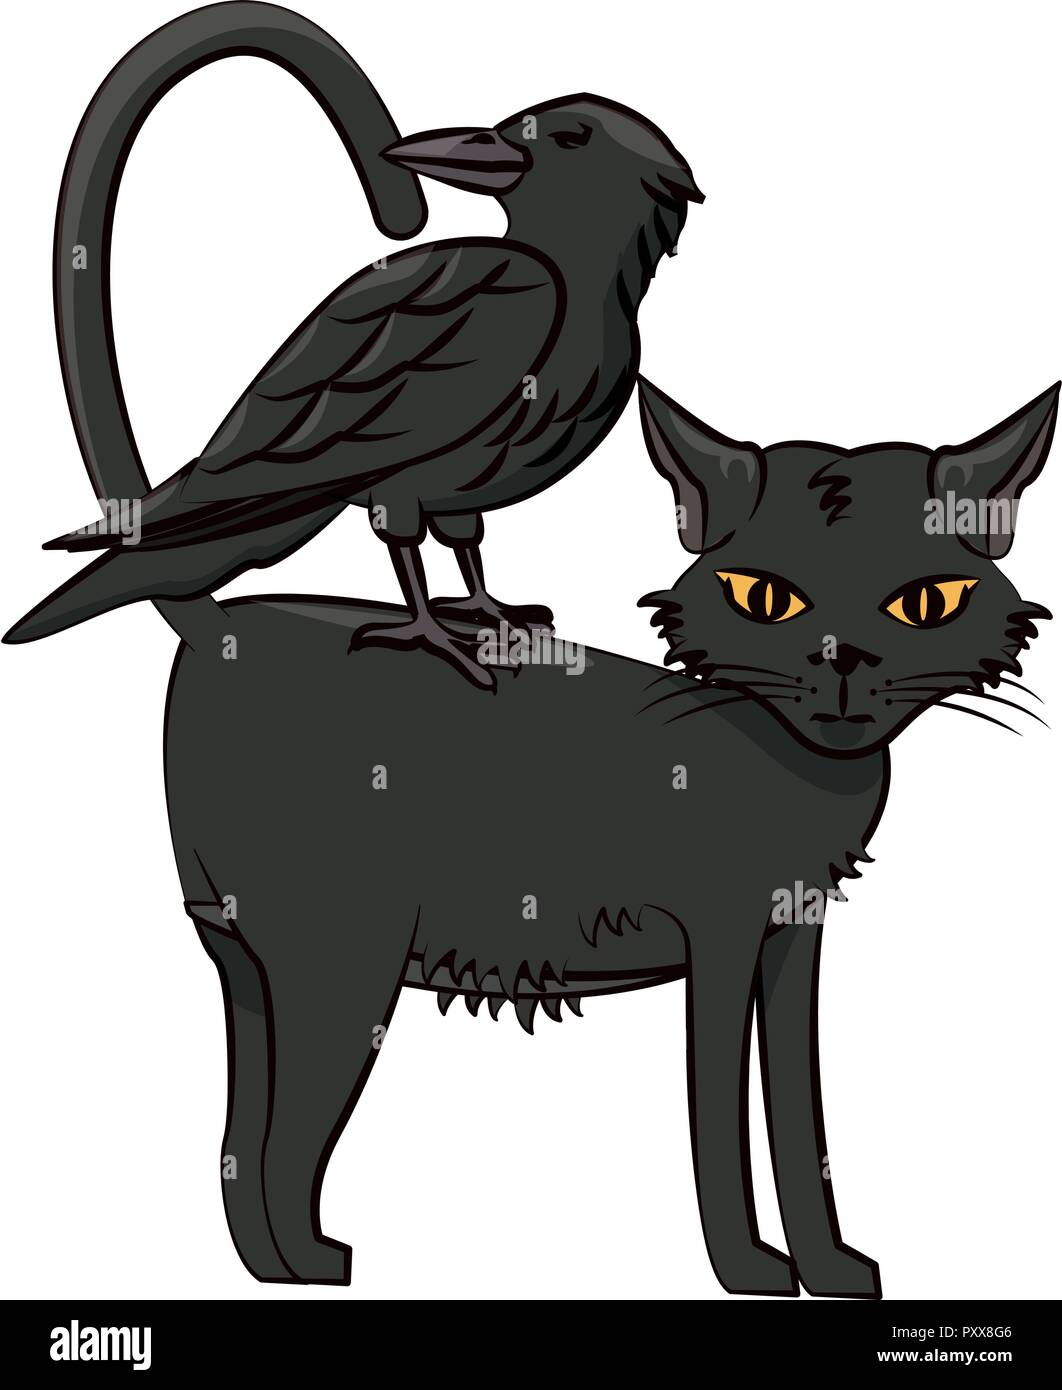 Halloween Scary Cartoons Stock Vector Image Art Alamy